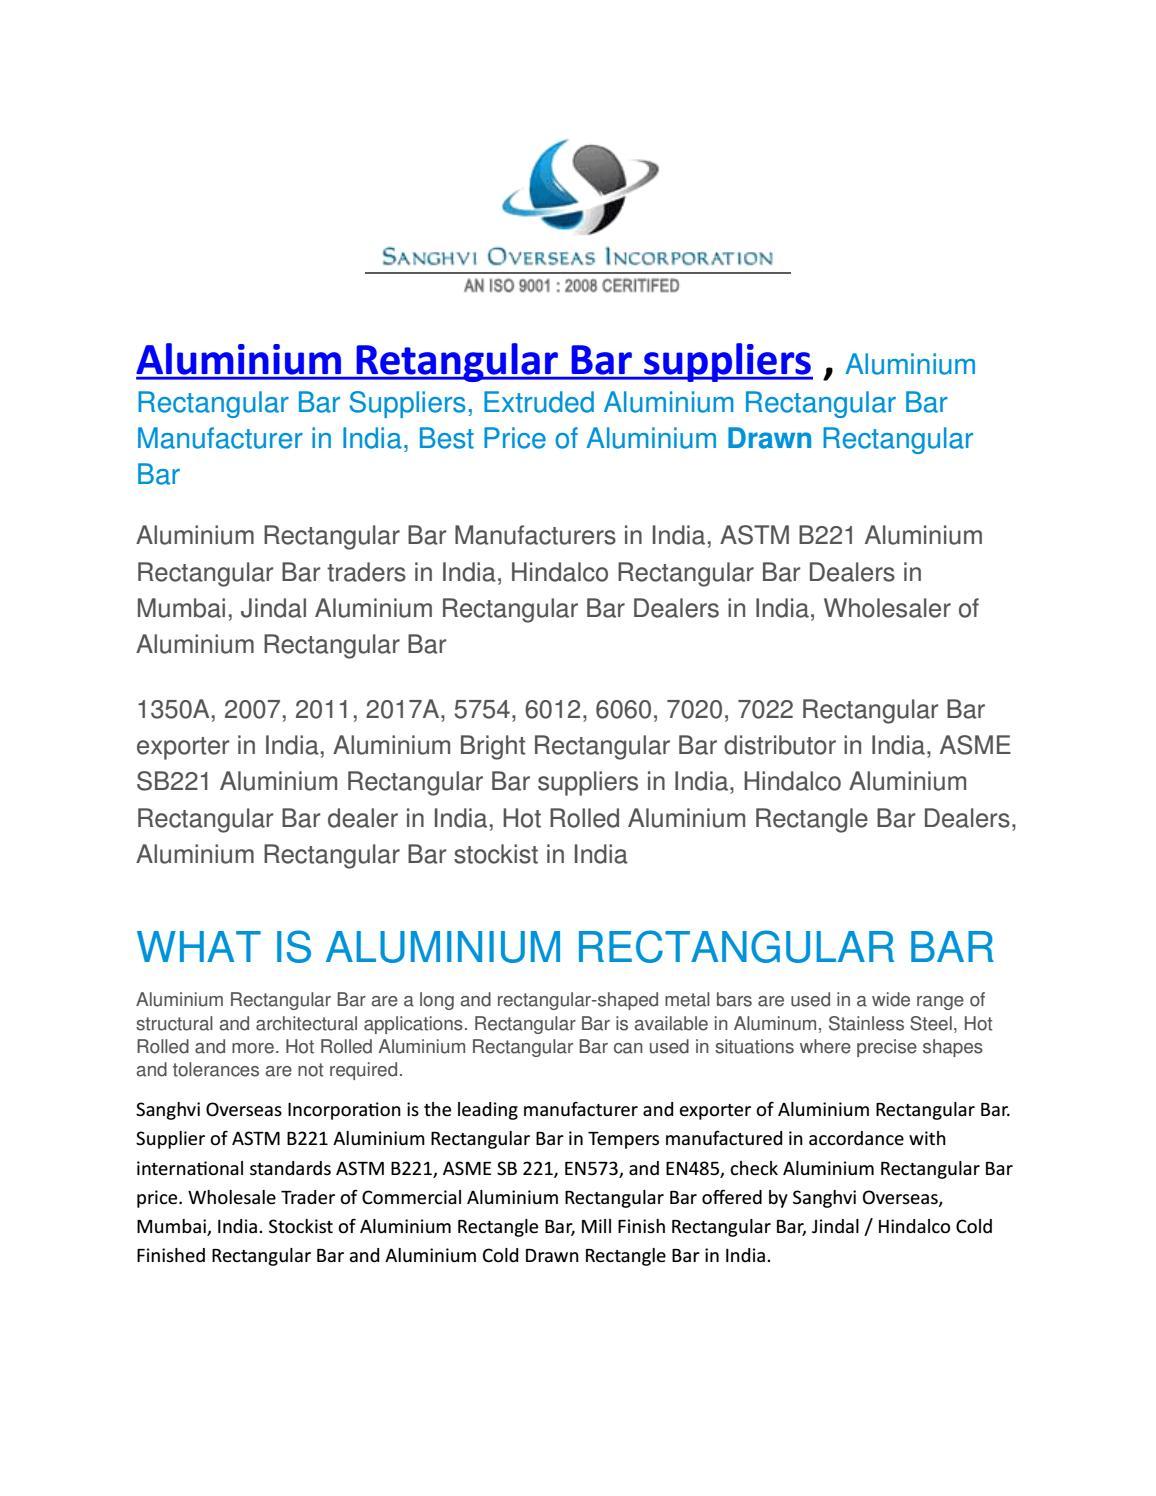 Aluminium retangular bar suppliers by sanghvioverseasinc - issuu